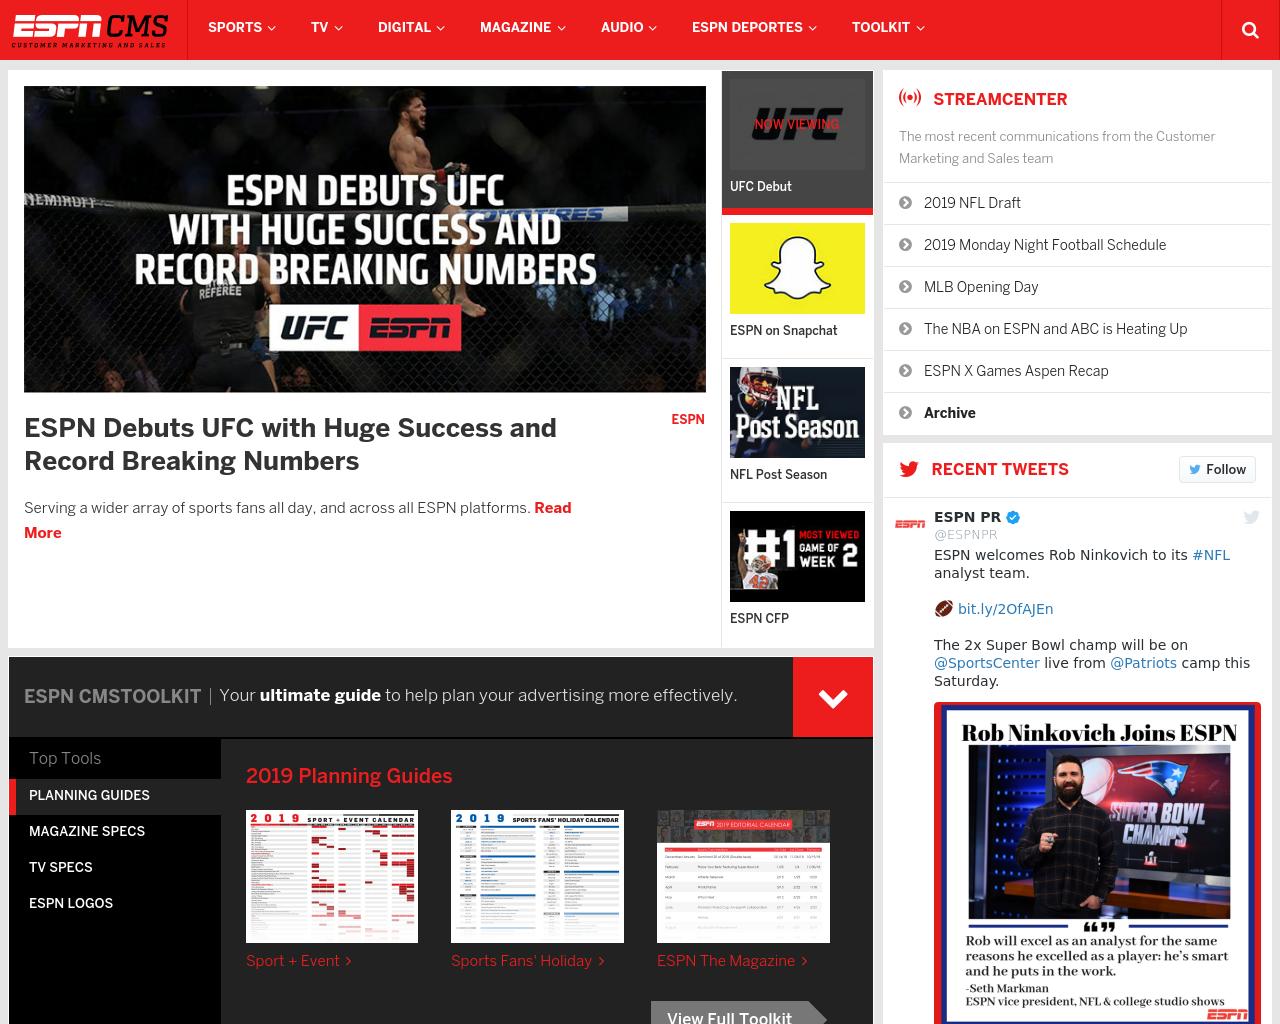 ESPN Media Advertising Mediakits, Reviews, Pricing, Traffic, Rate